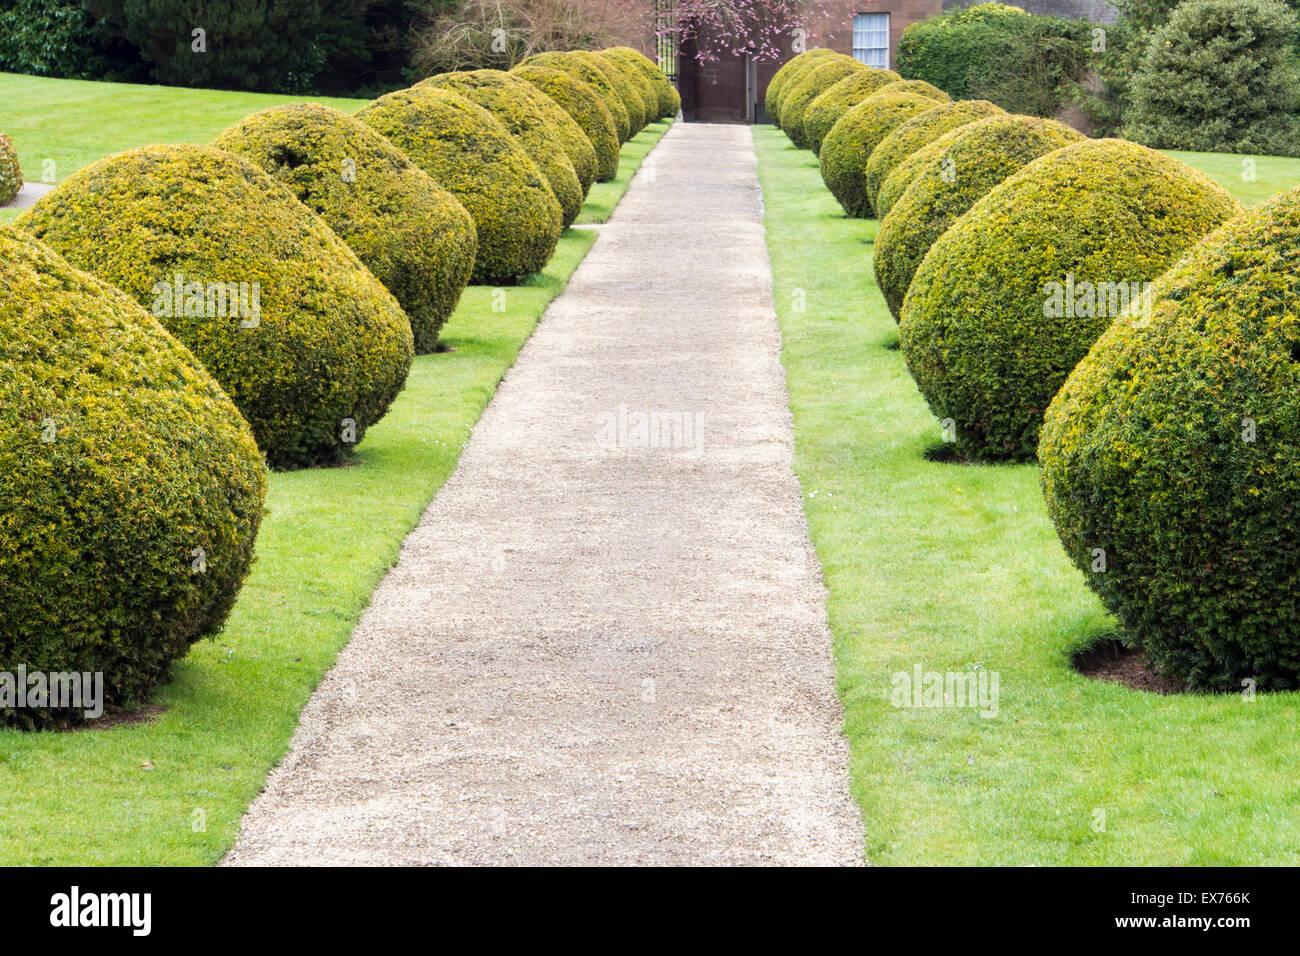 Part of the garden at Berrington Hall near Leominster, Herefordshire, UK. Stock Photo